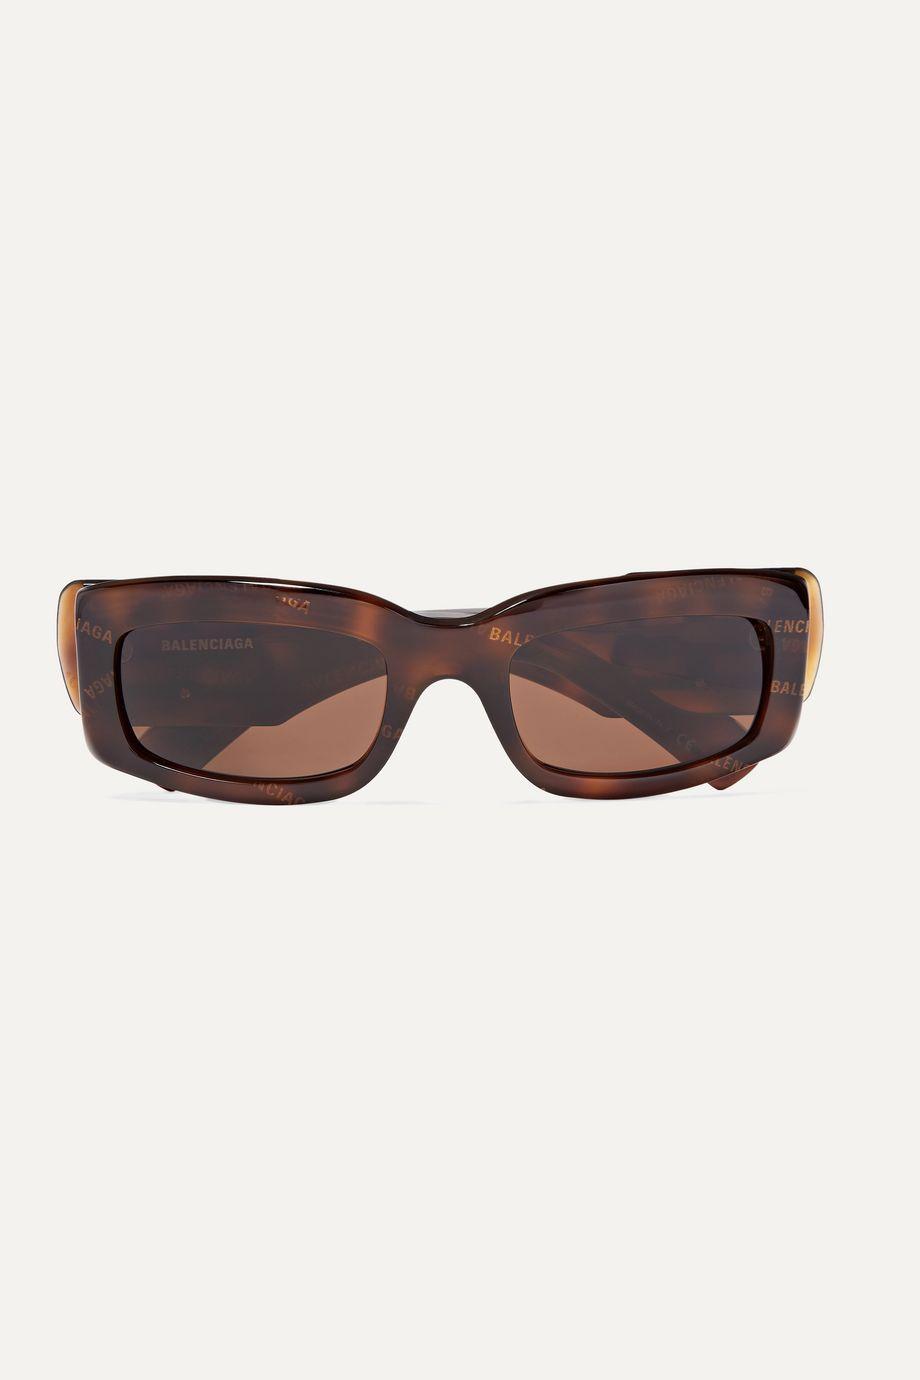 Balenciaga Paris printed square-frame tortoiseshell acetate sunglasses